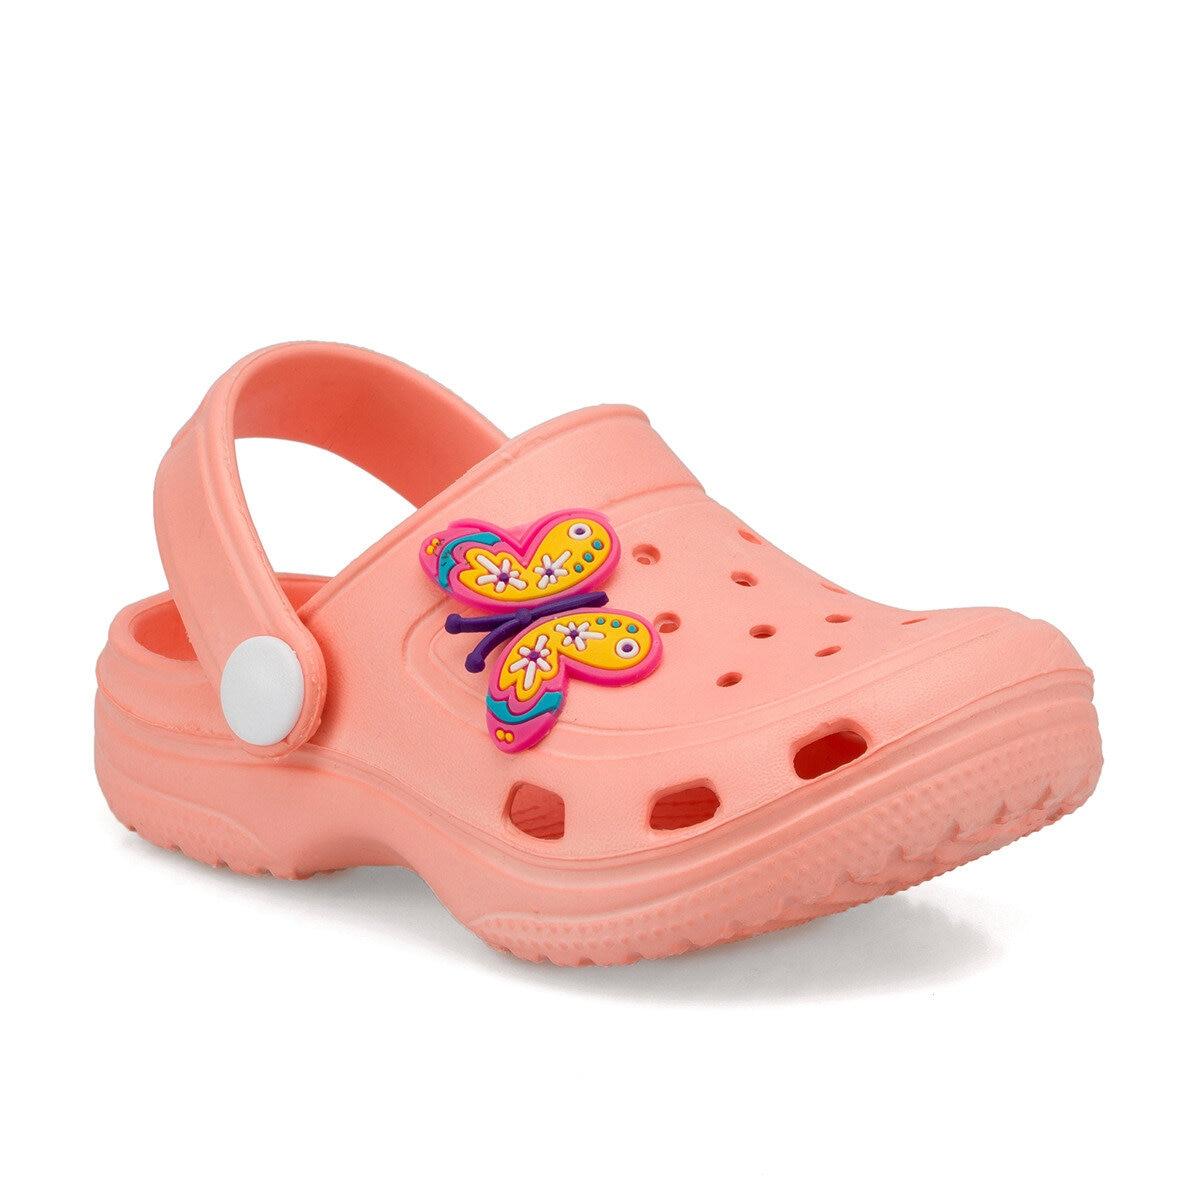 FLO Frog Coral Female Child Sea Shoes KINETIX